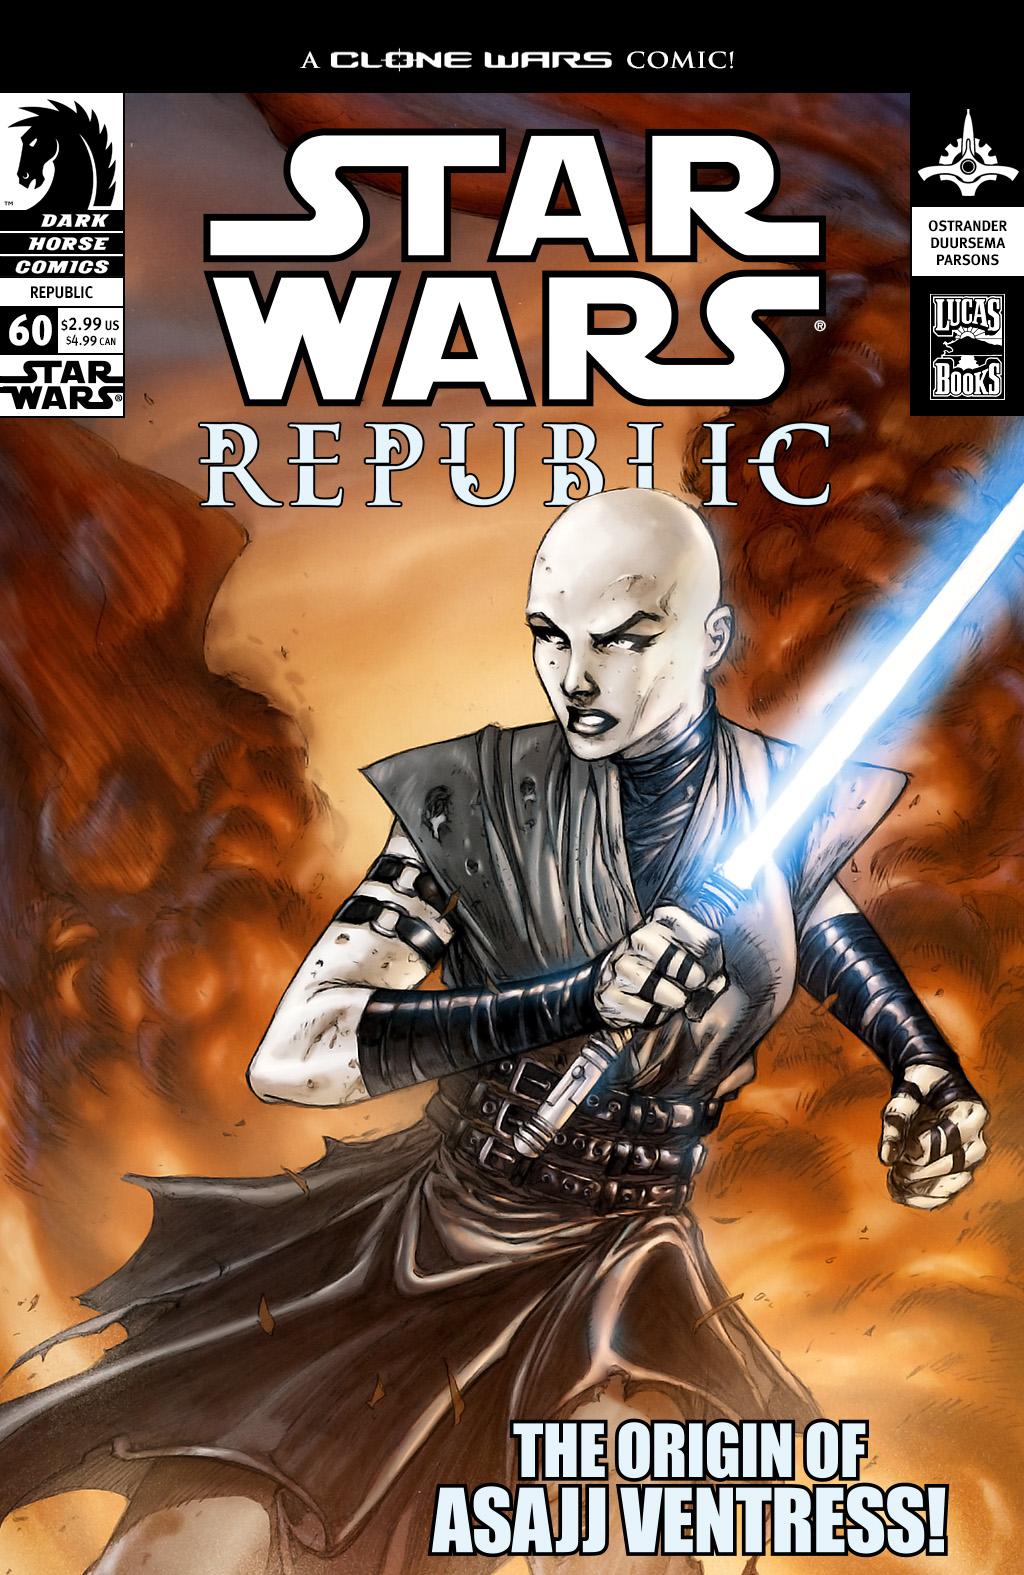 Star Wars: Republic 60 Page 1